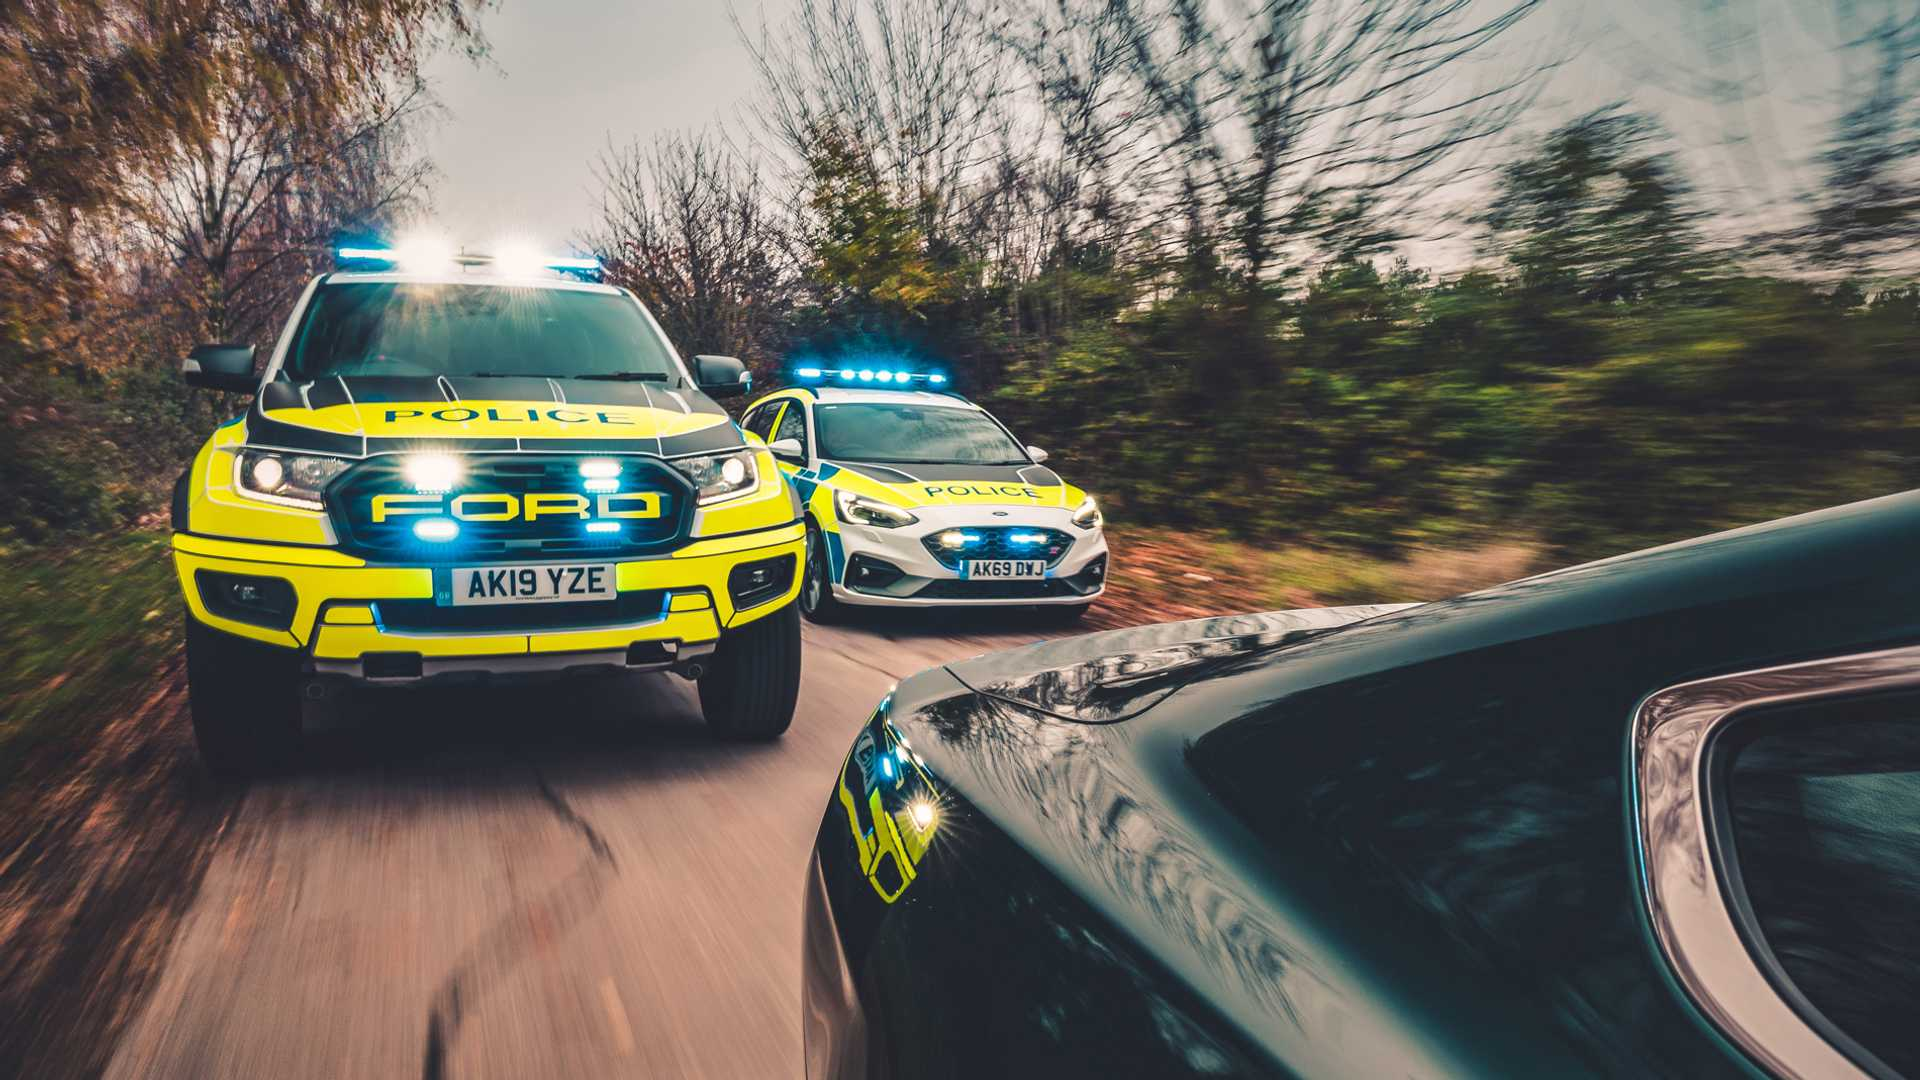 Ford-Focus-ST-and-Ranger-Raptor-UK-police-cars-1